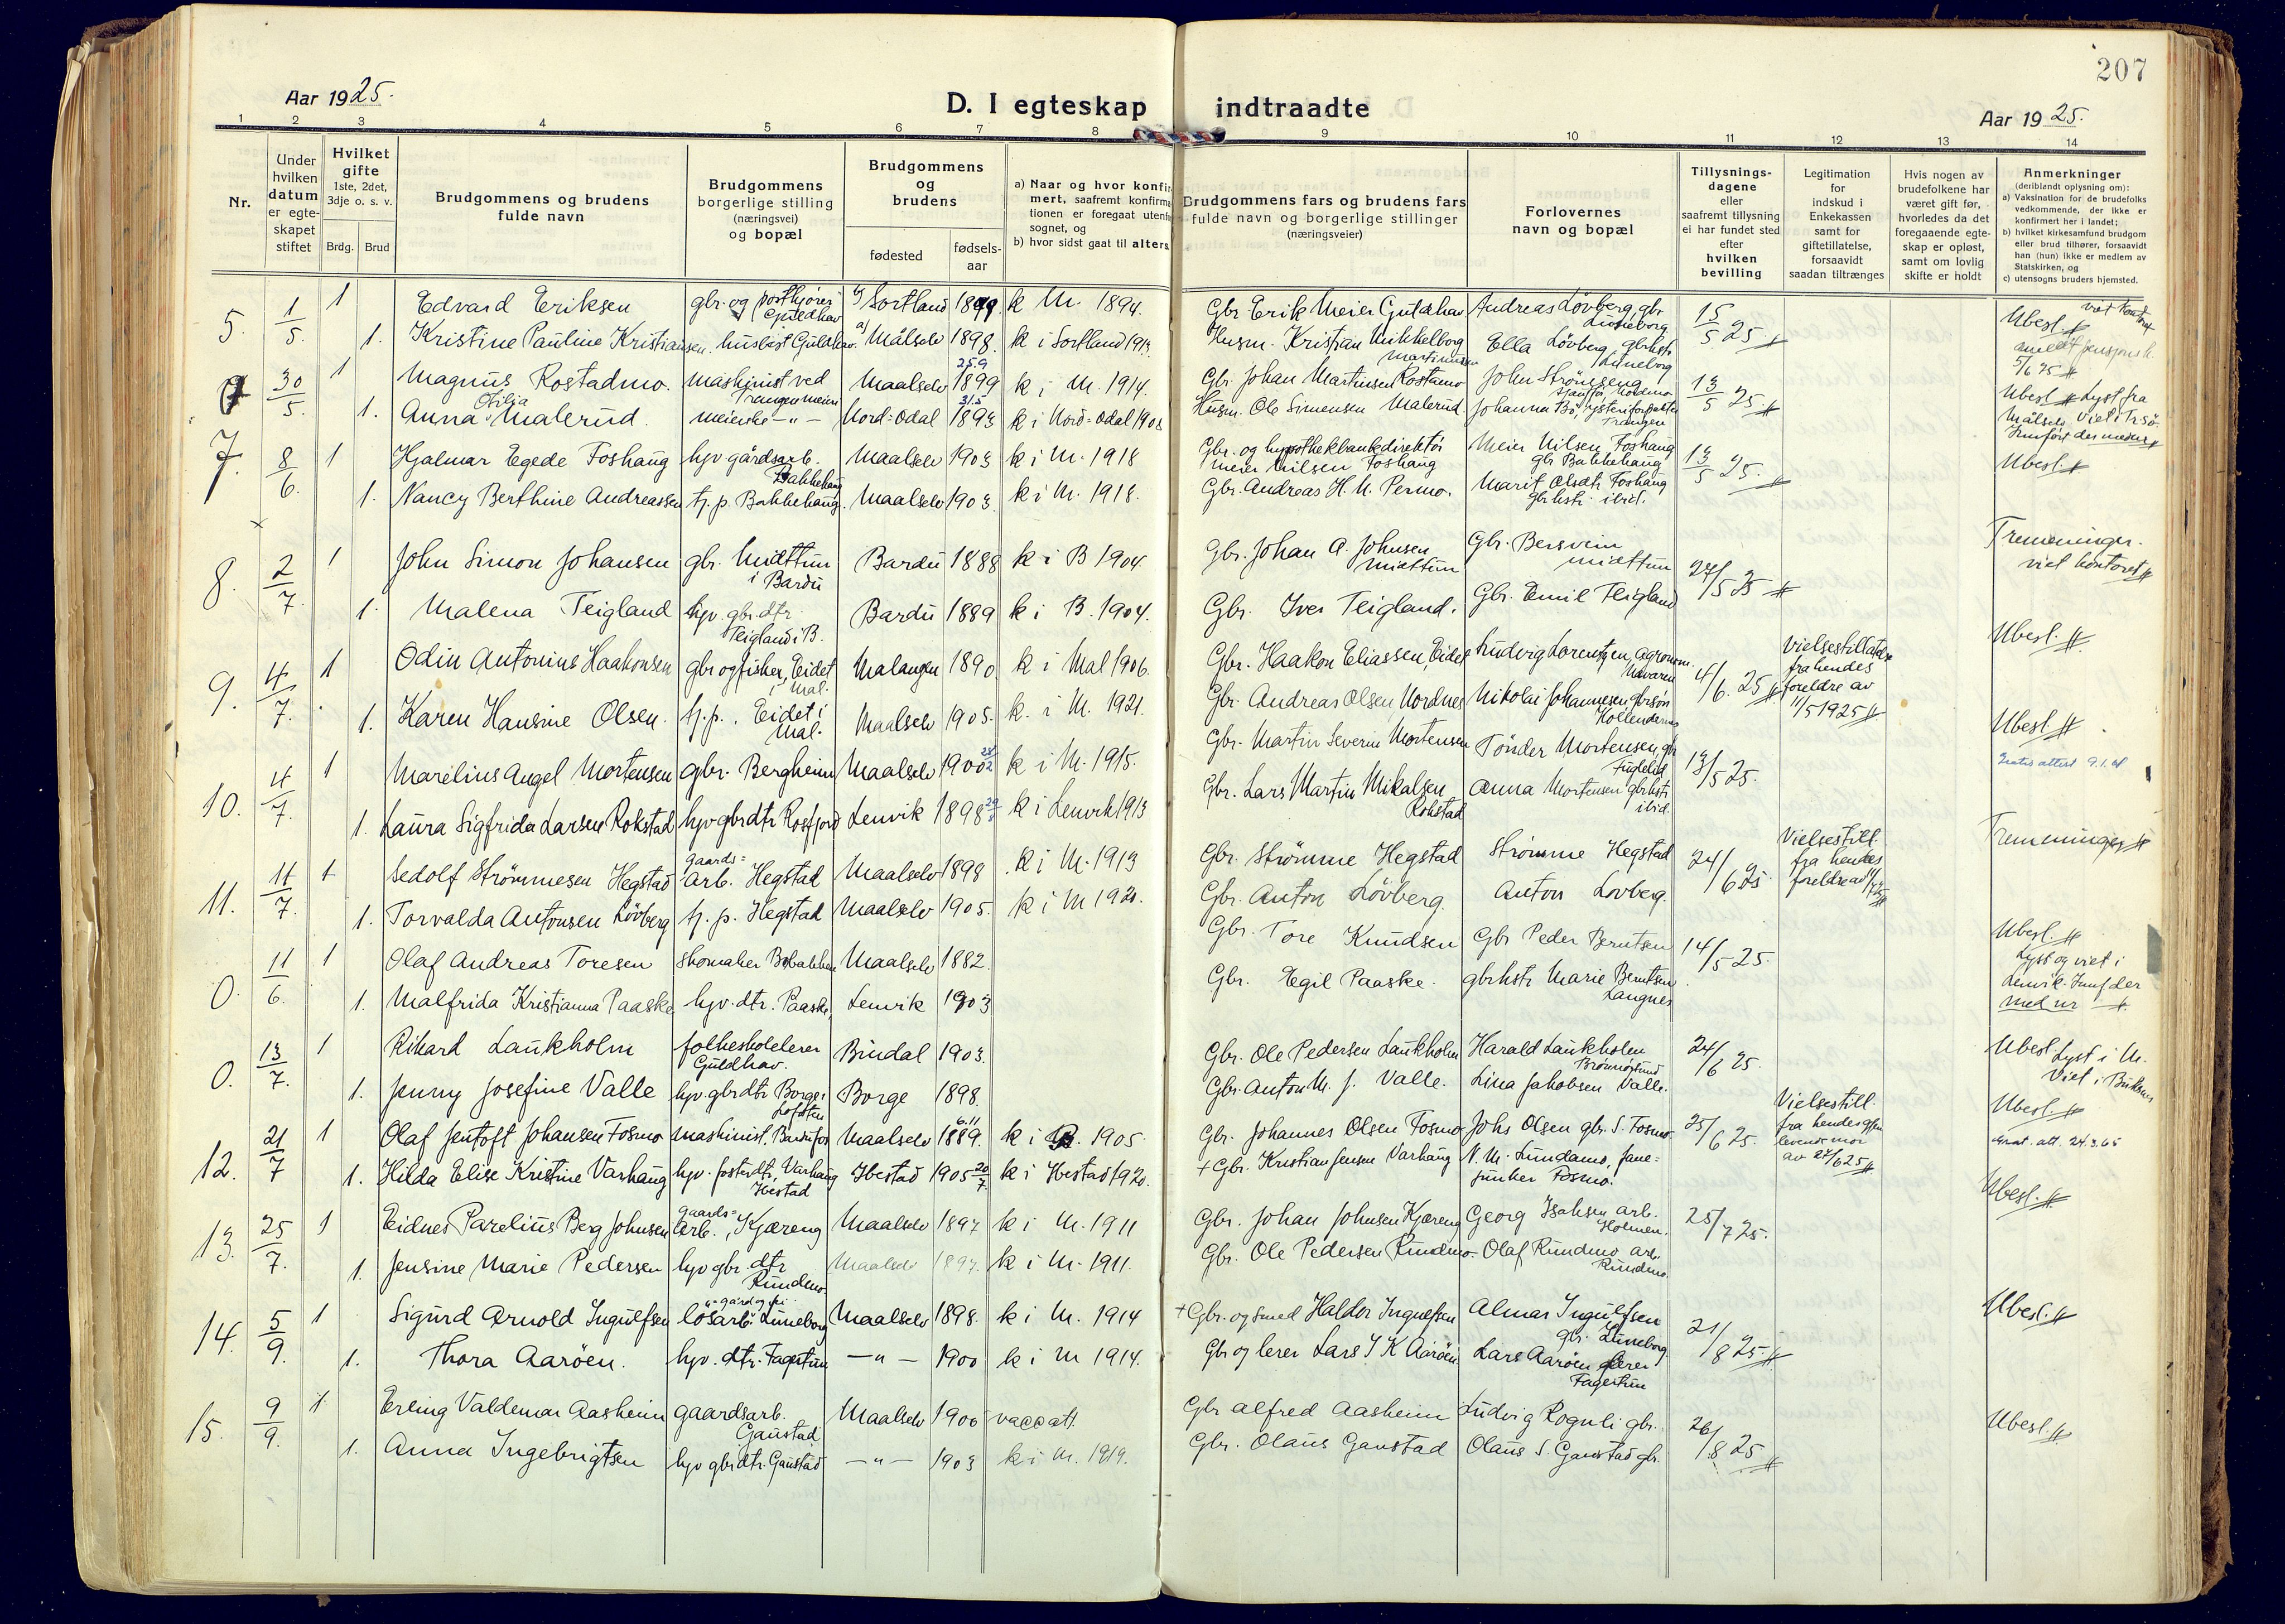 SATØ, Målselv sokneprestembete, Ministerialbok nr. 14, 1919-1932, s. 207